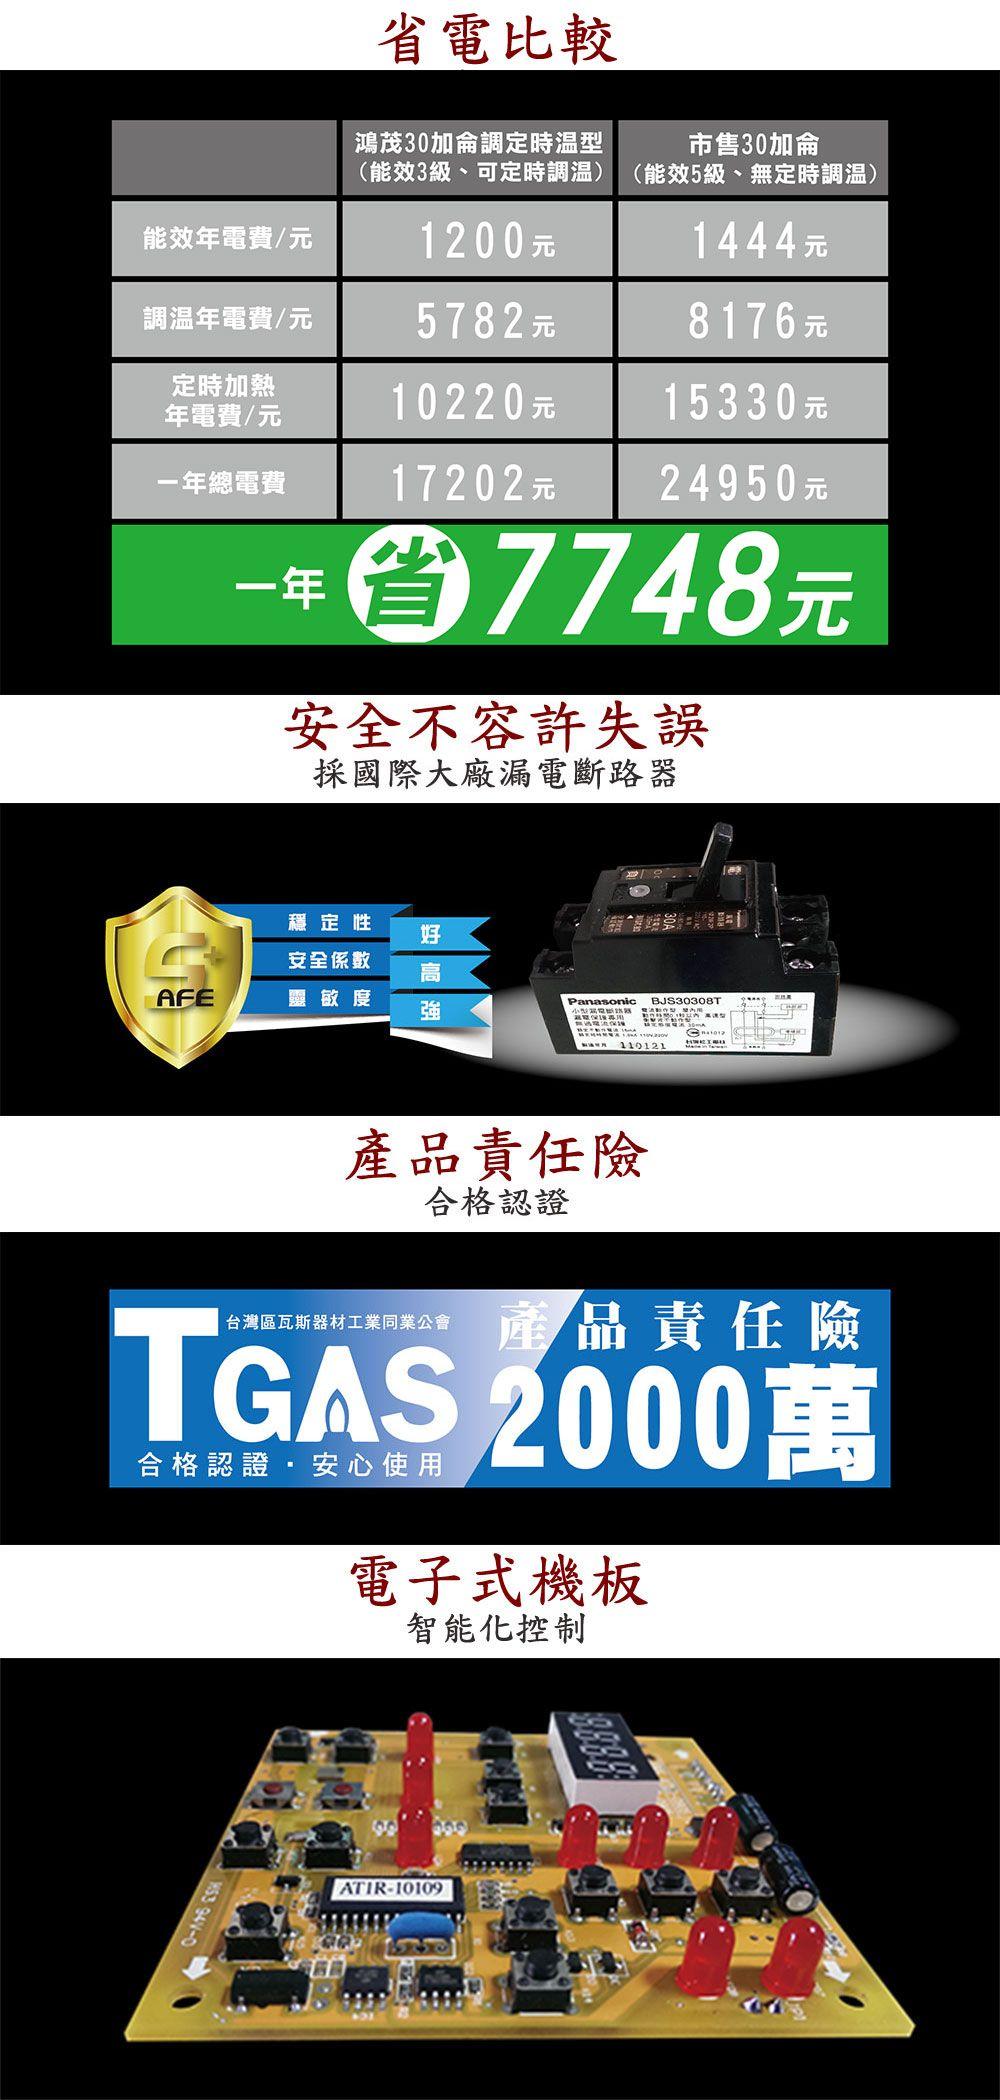 PK/goods/HMK/電熱水器/ATS/2.jpg